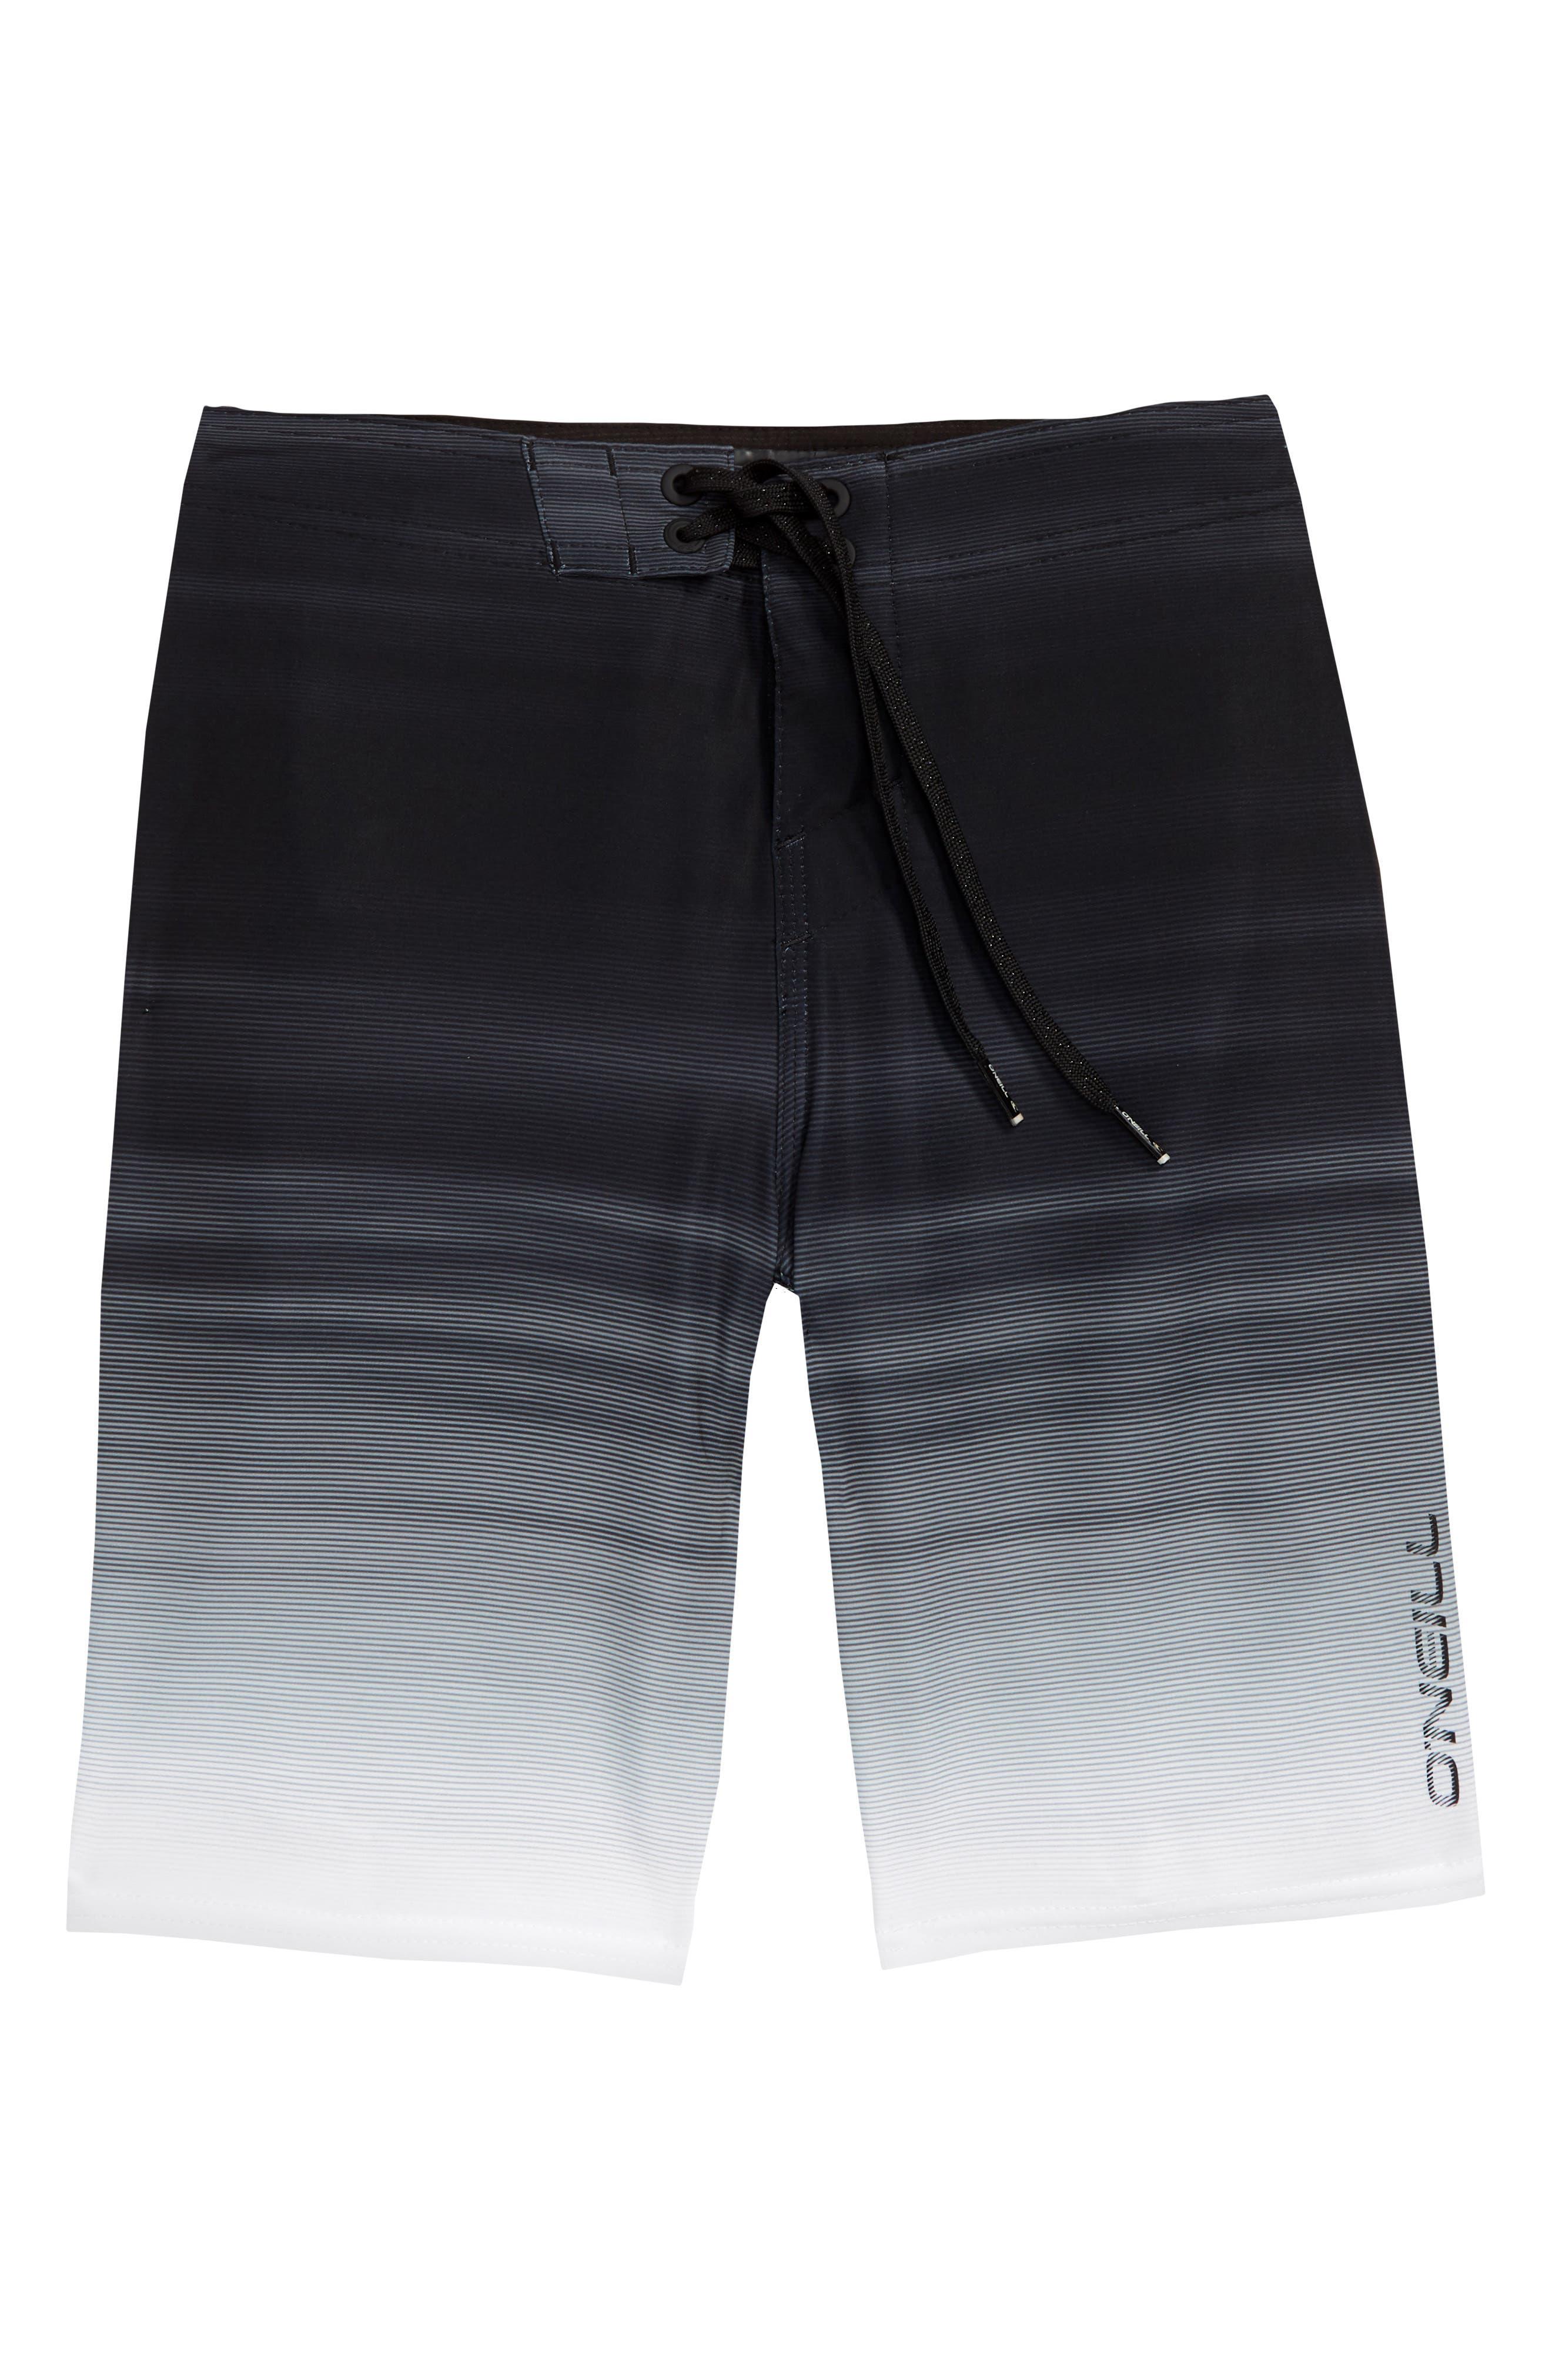 Sneakyfreak Mysto Board Shorts,                             Main thumbnail 1, color,                             Black